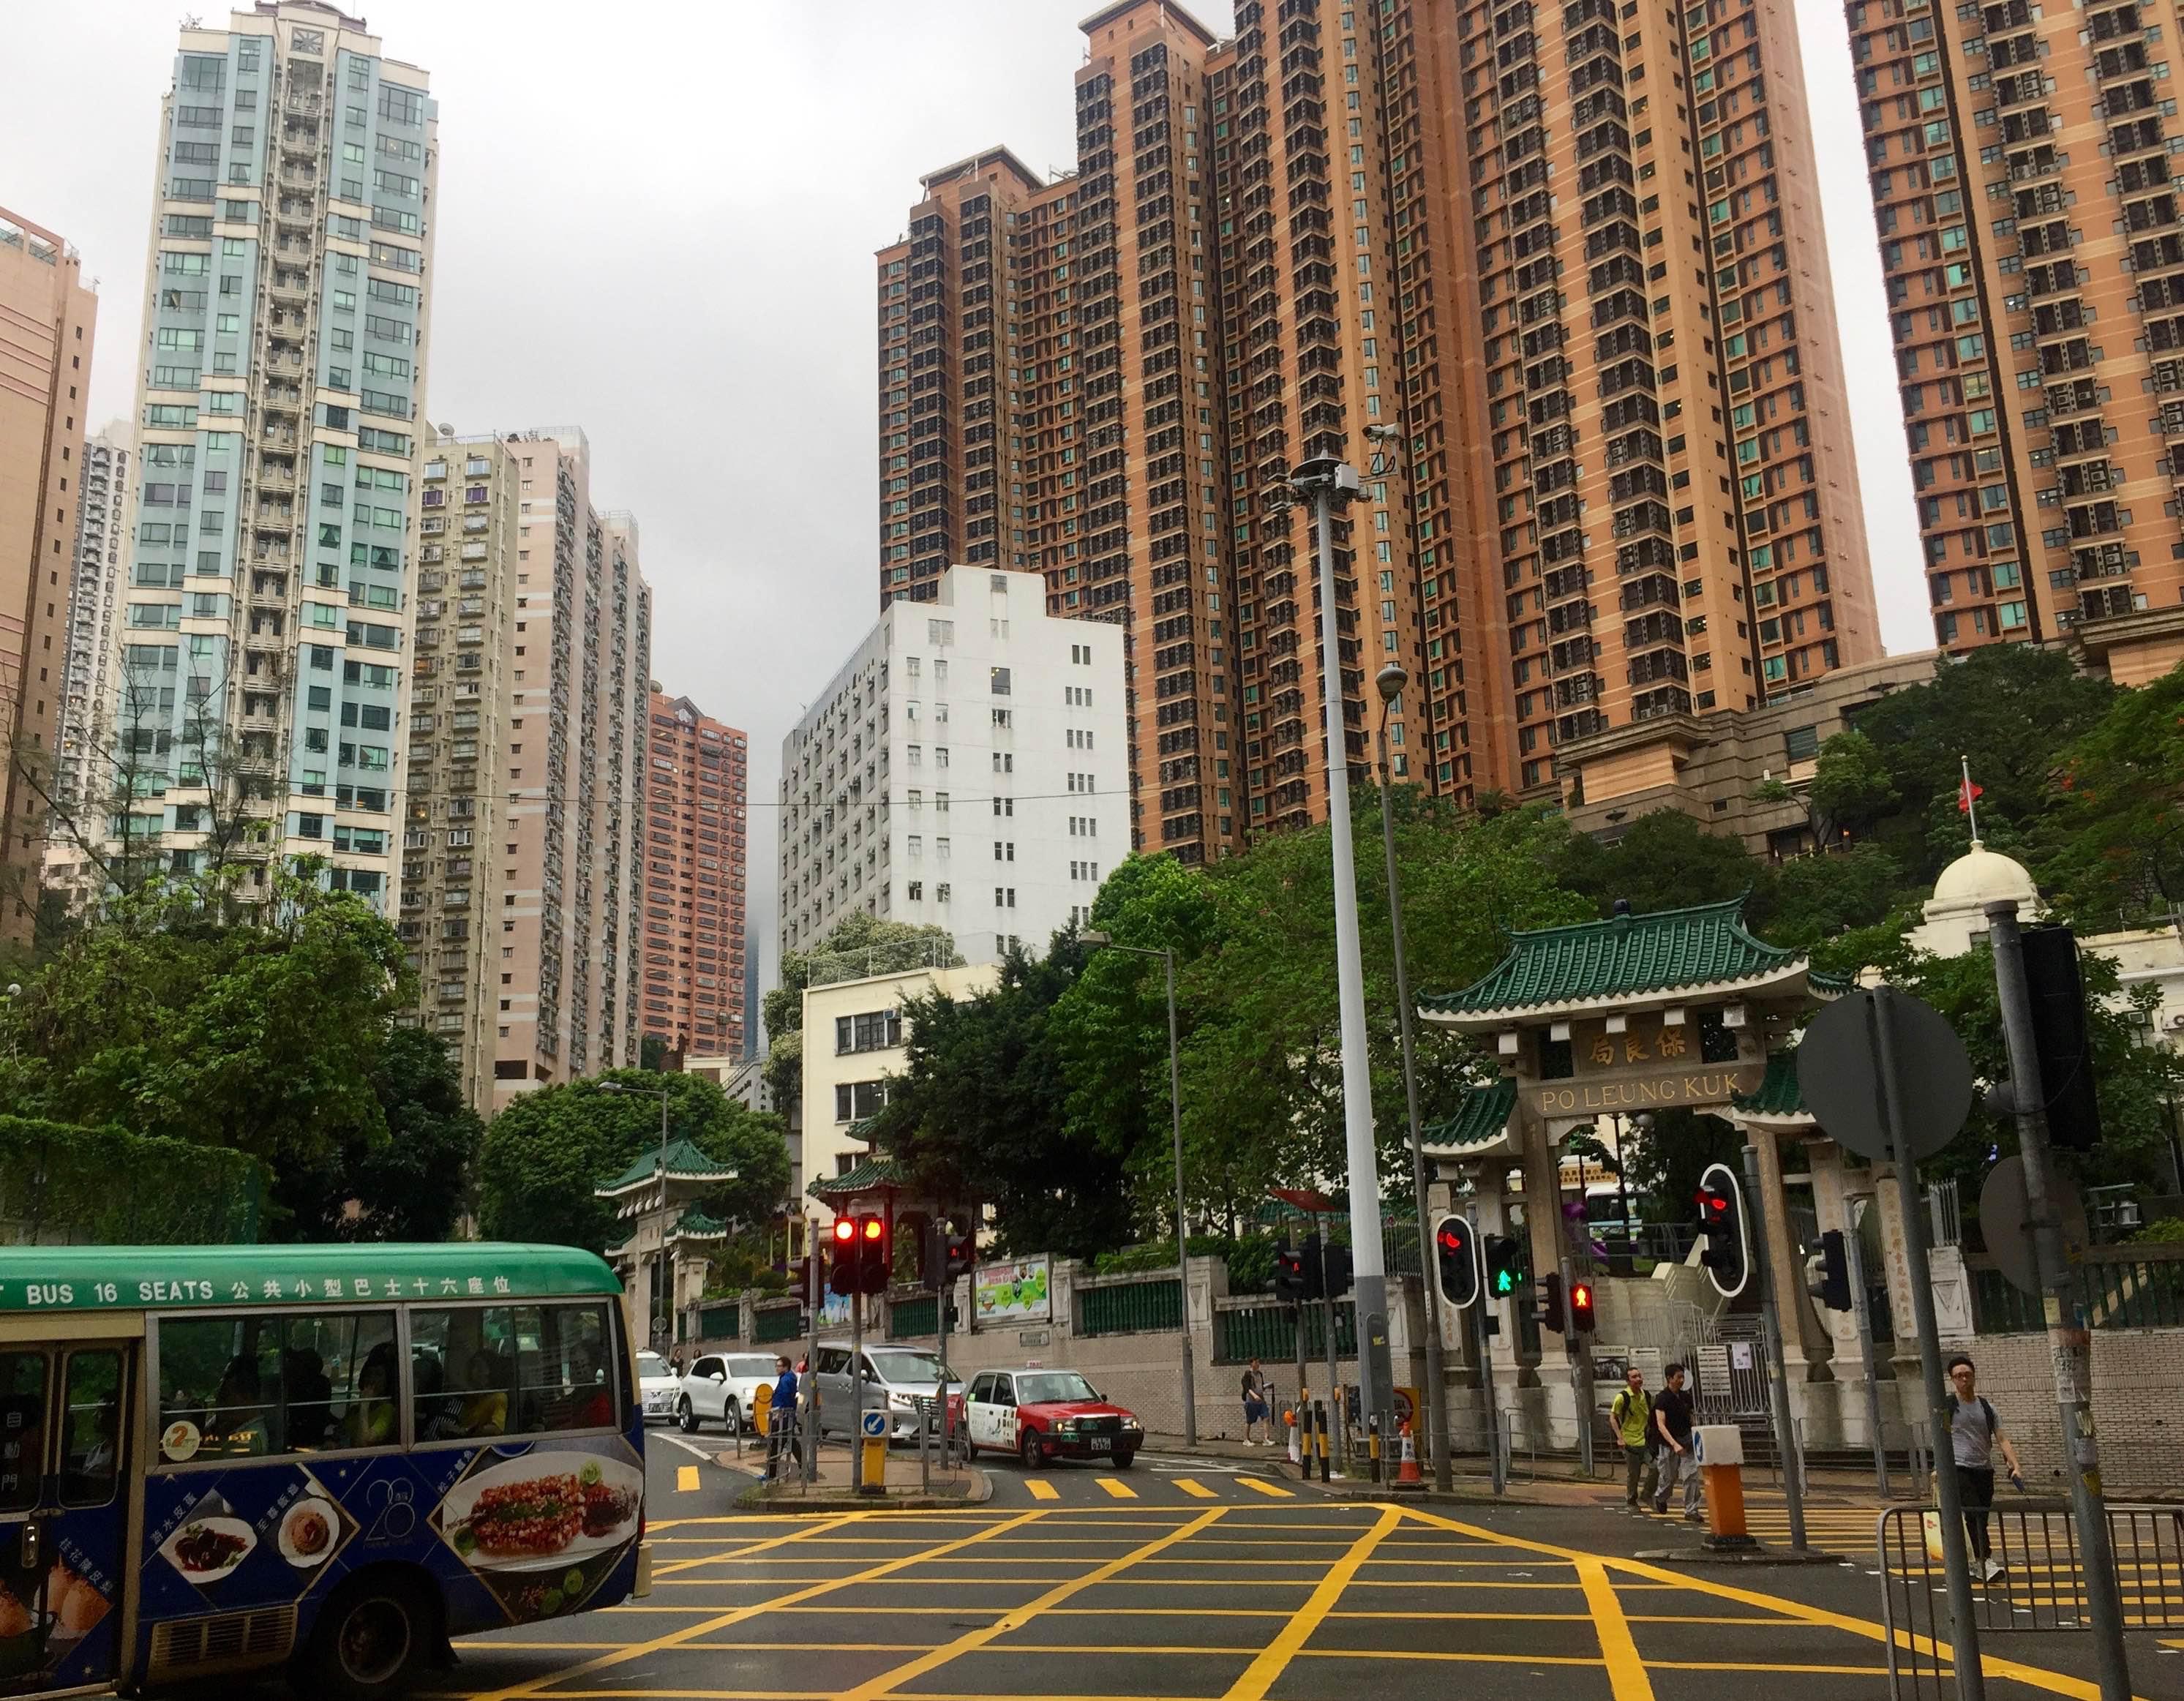 Hong Kong Causeway Bay guaranteed FnB traffic - residents and office crowds